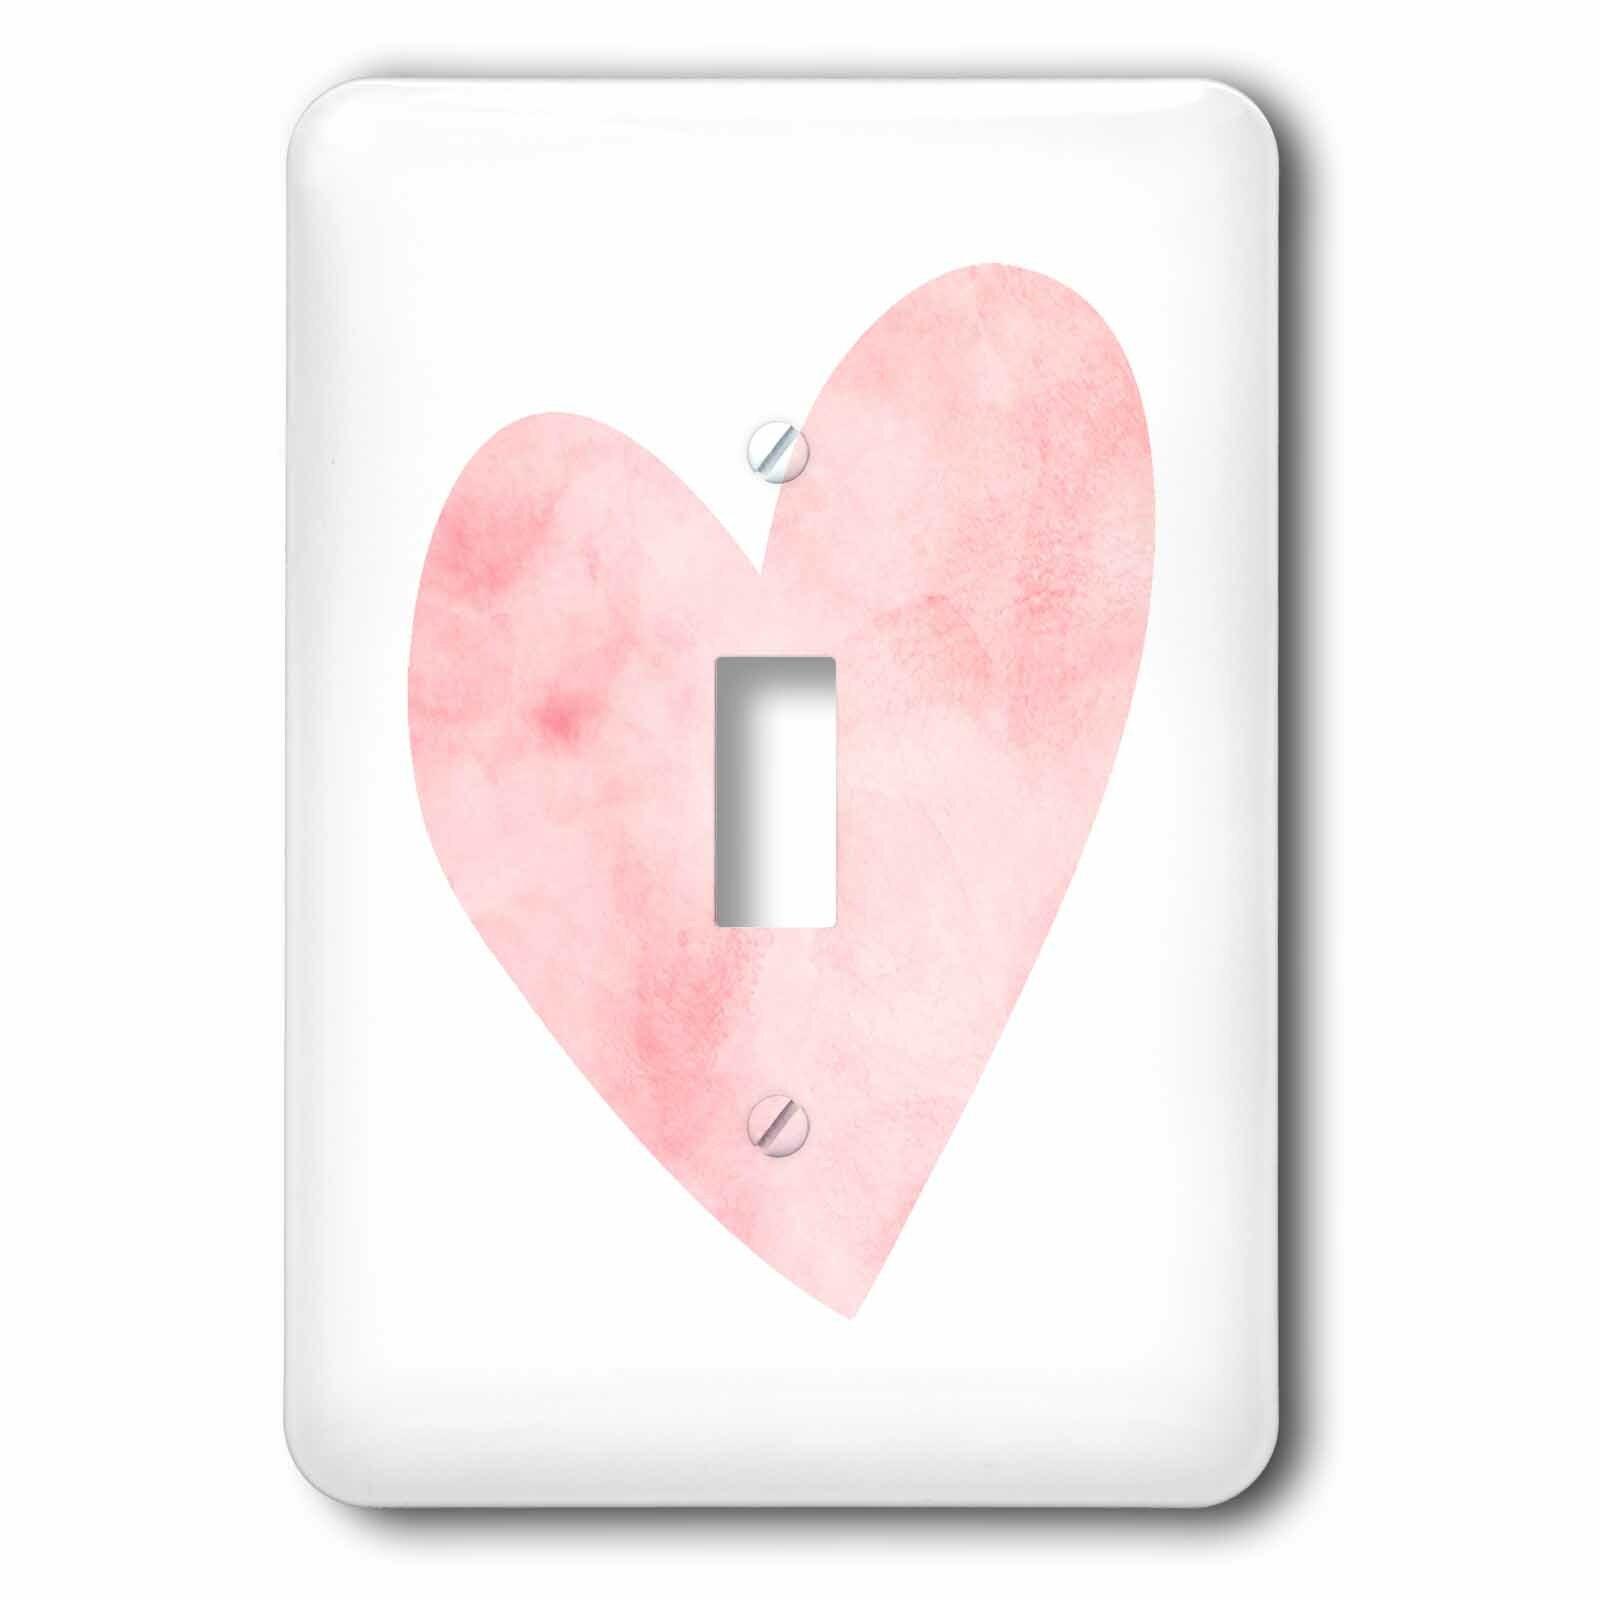 3drose Pretty Blush Water Heart 1 Gang Toggle Light Switch Wall Plate Wayfair